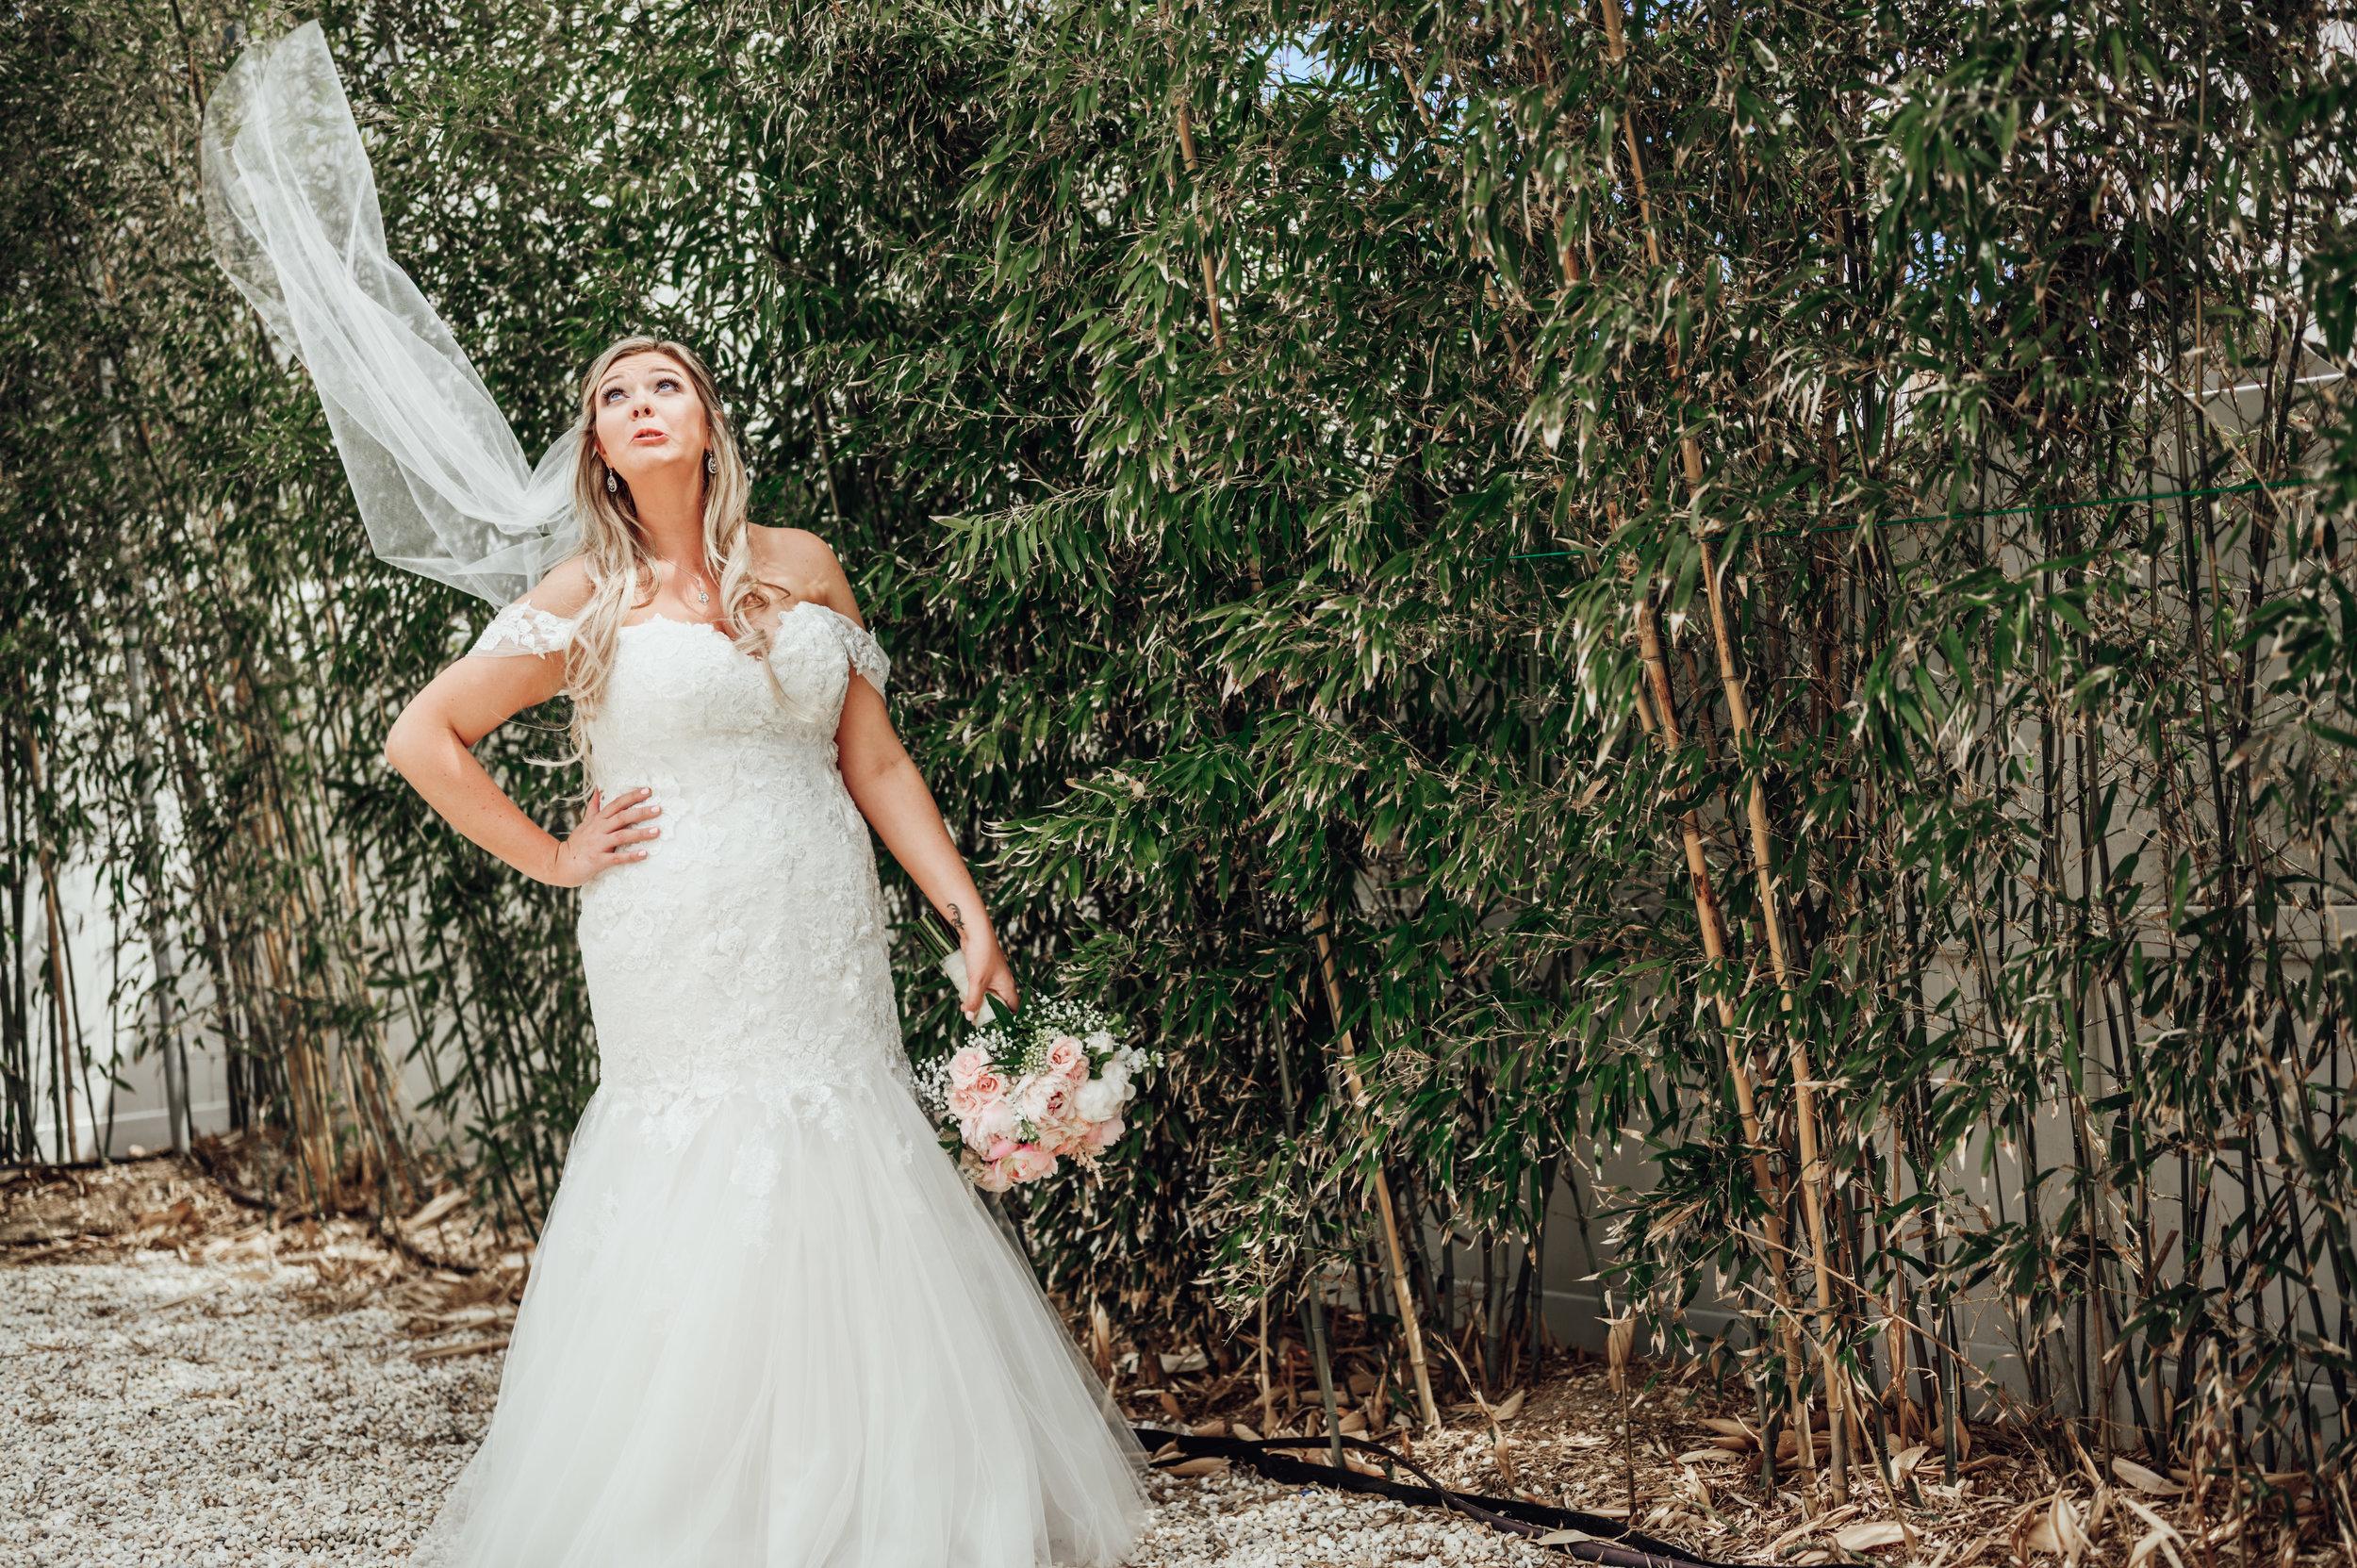 New Jersey Wedding Photographer, Felsberg Photography LBI wedding photography 56.jpg